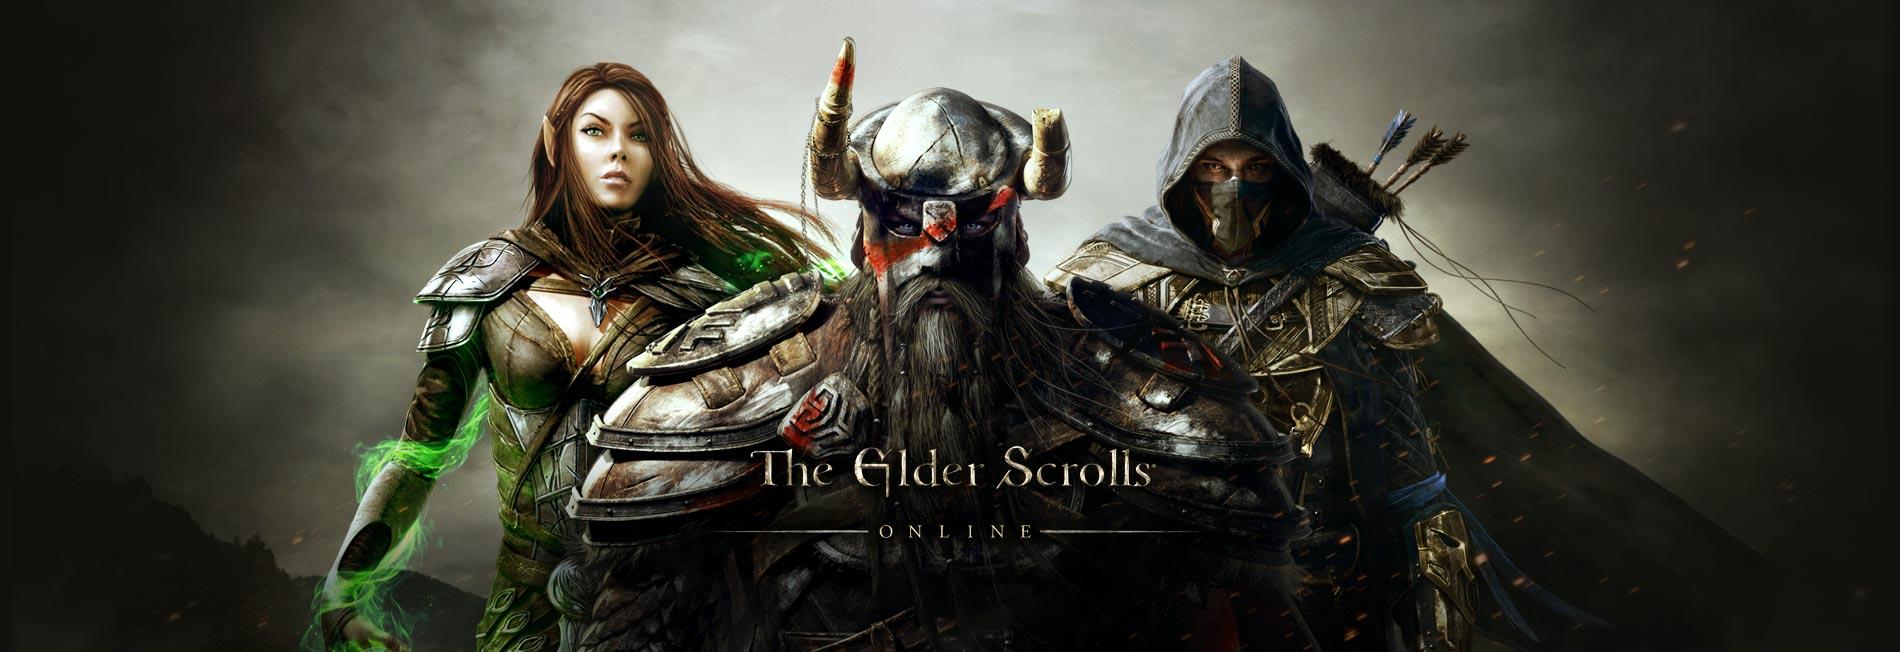 Jimeee/Elder Scrolls Online: Introduction to the Lore